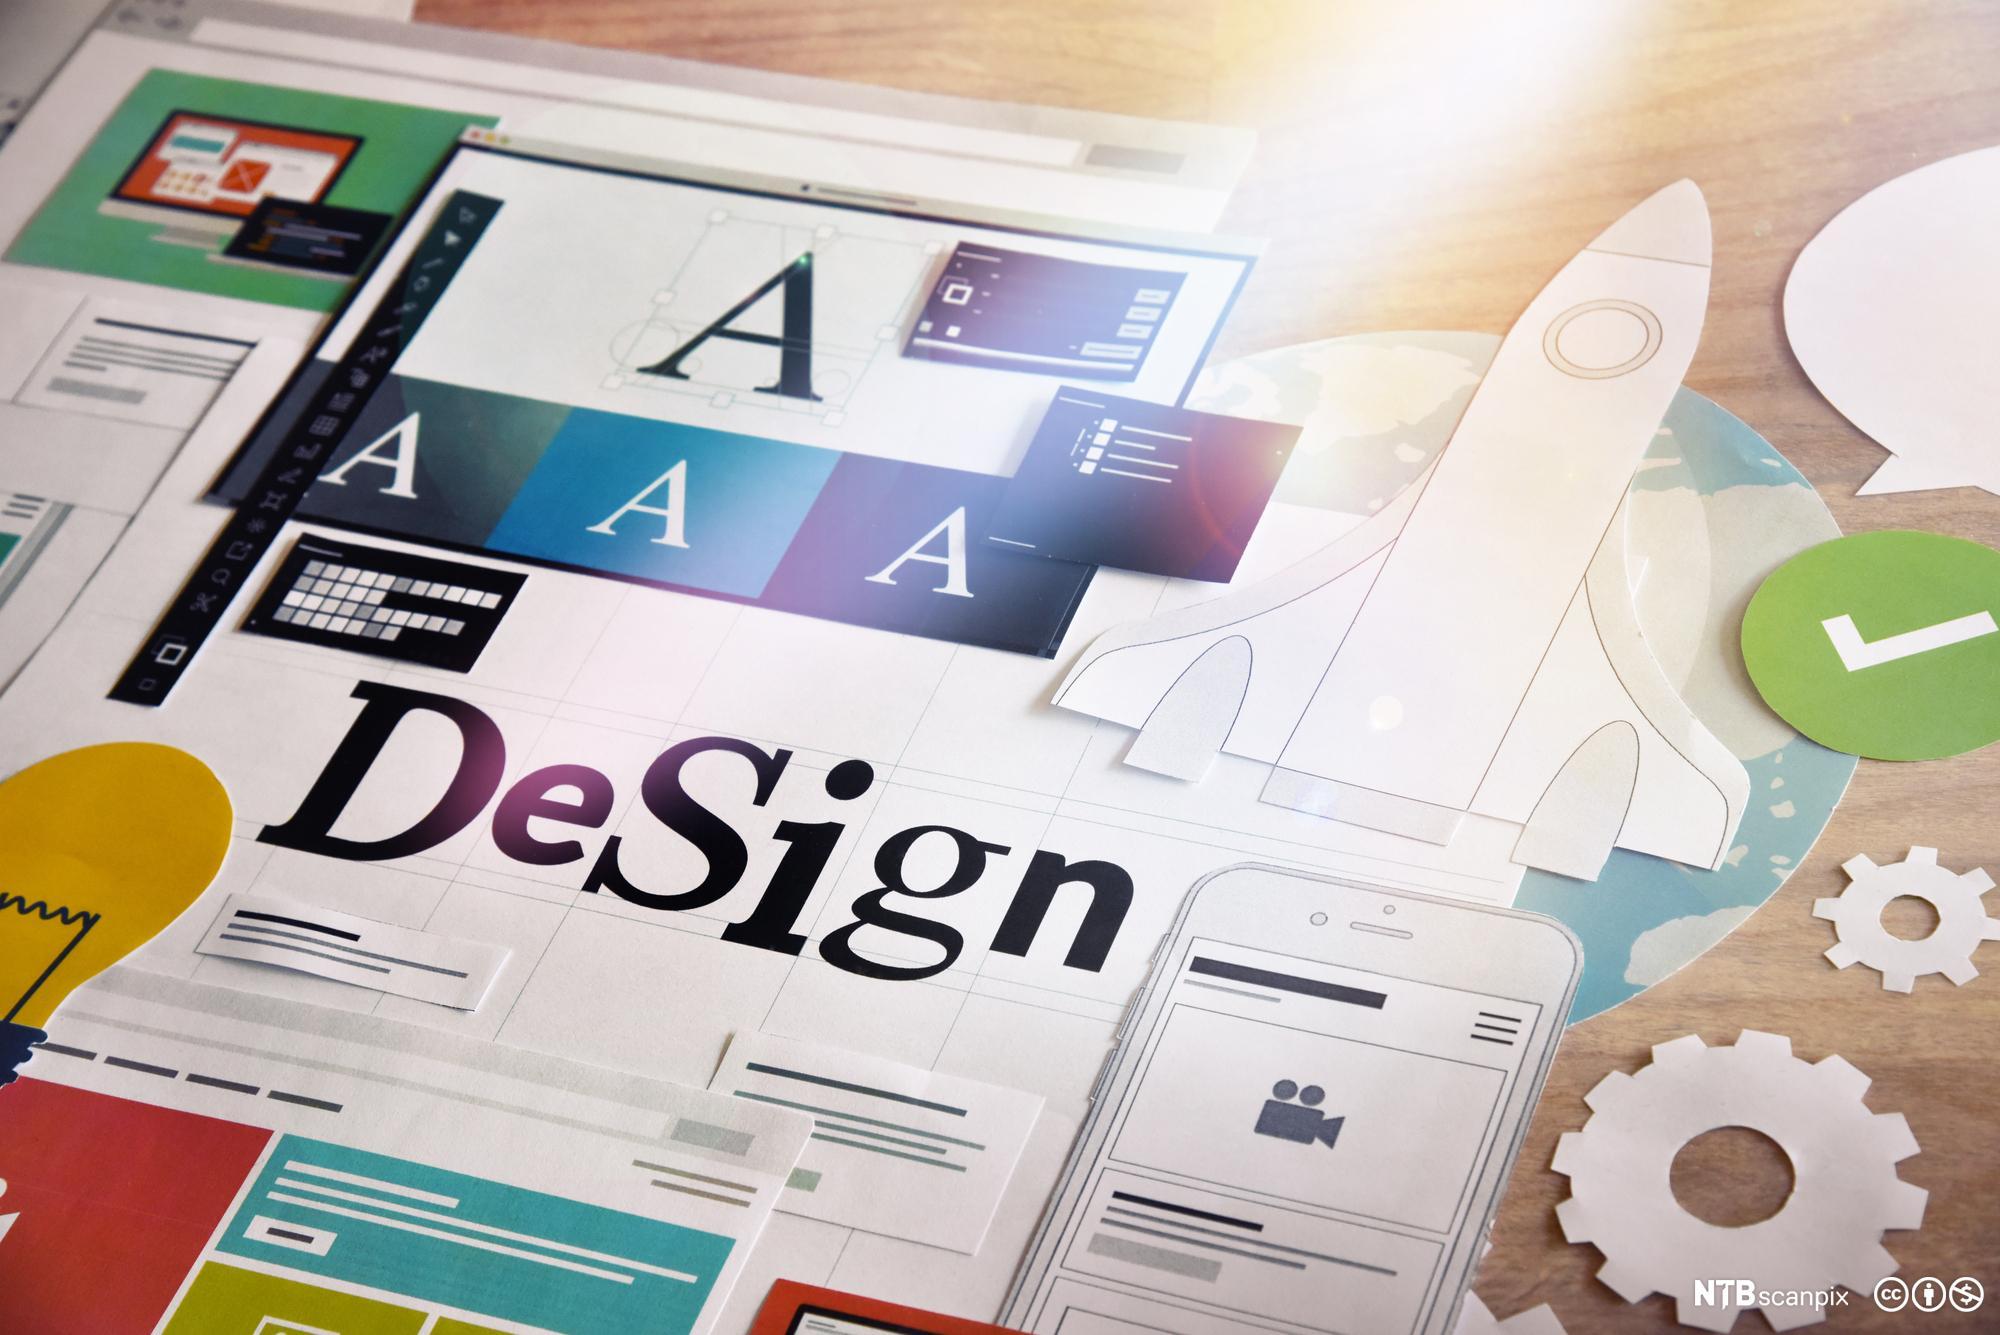 cce26286 Medieuttrykk og mediesamfunnet - Grafisk design - NDLA